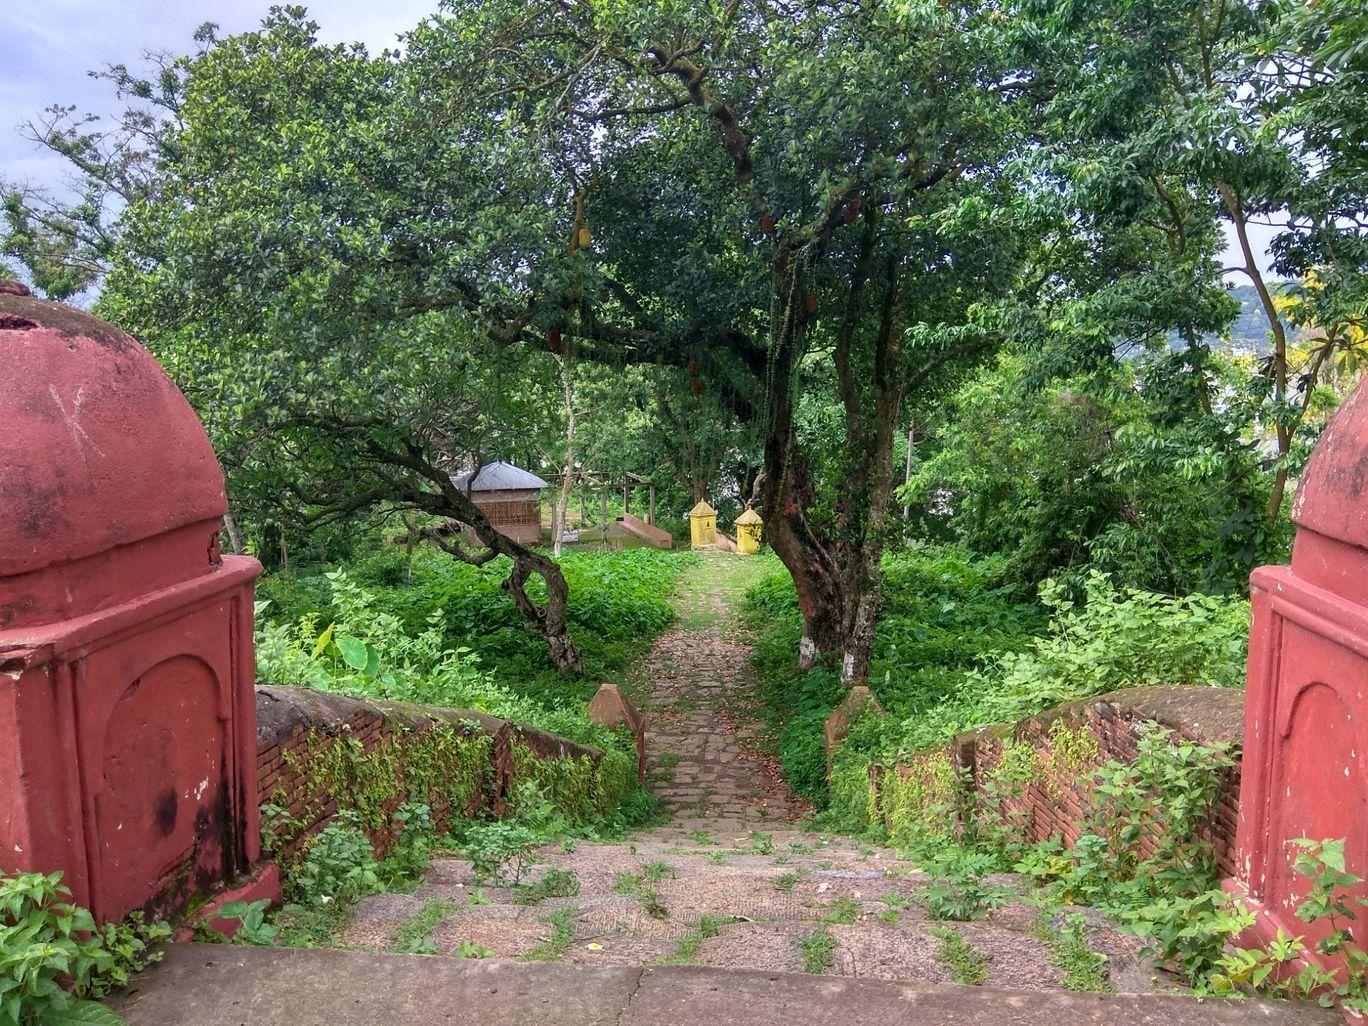 Photo of Aswaklanta Mandir By Anurag shrivastava